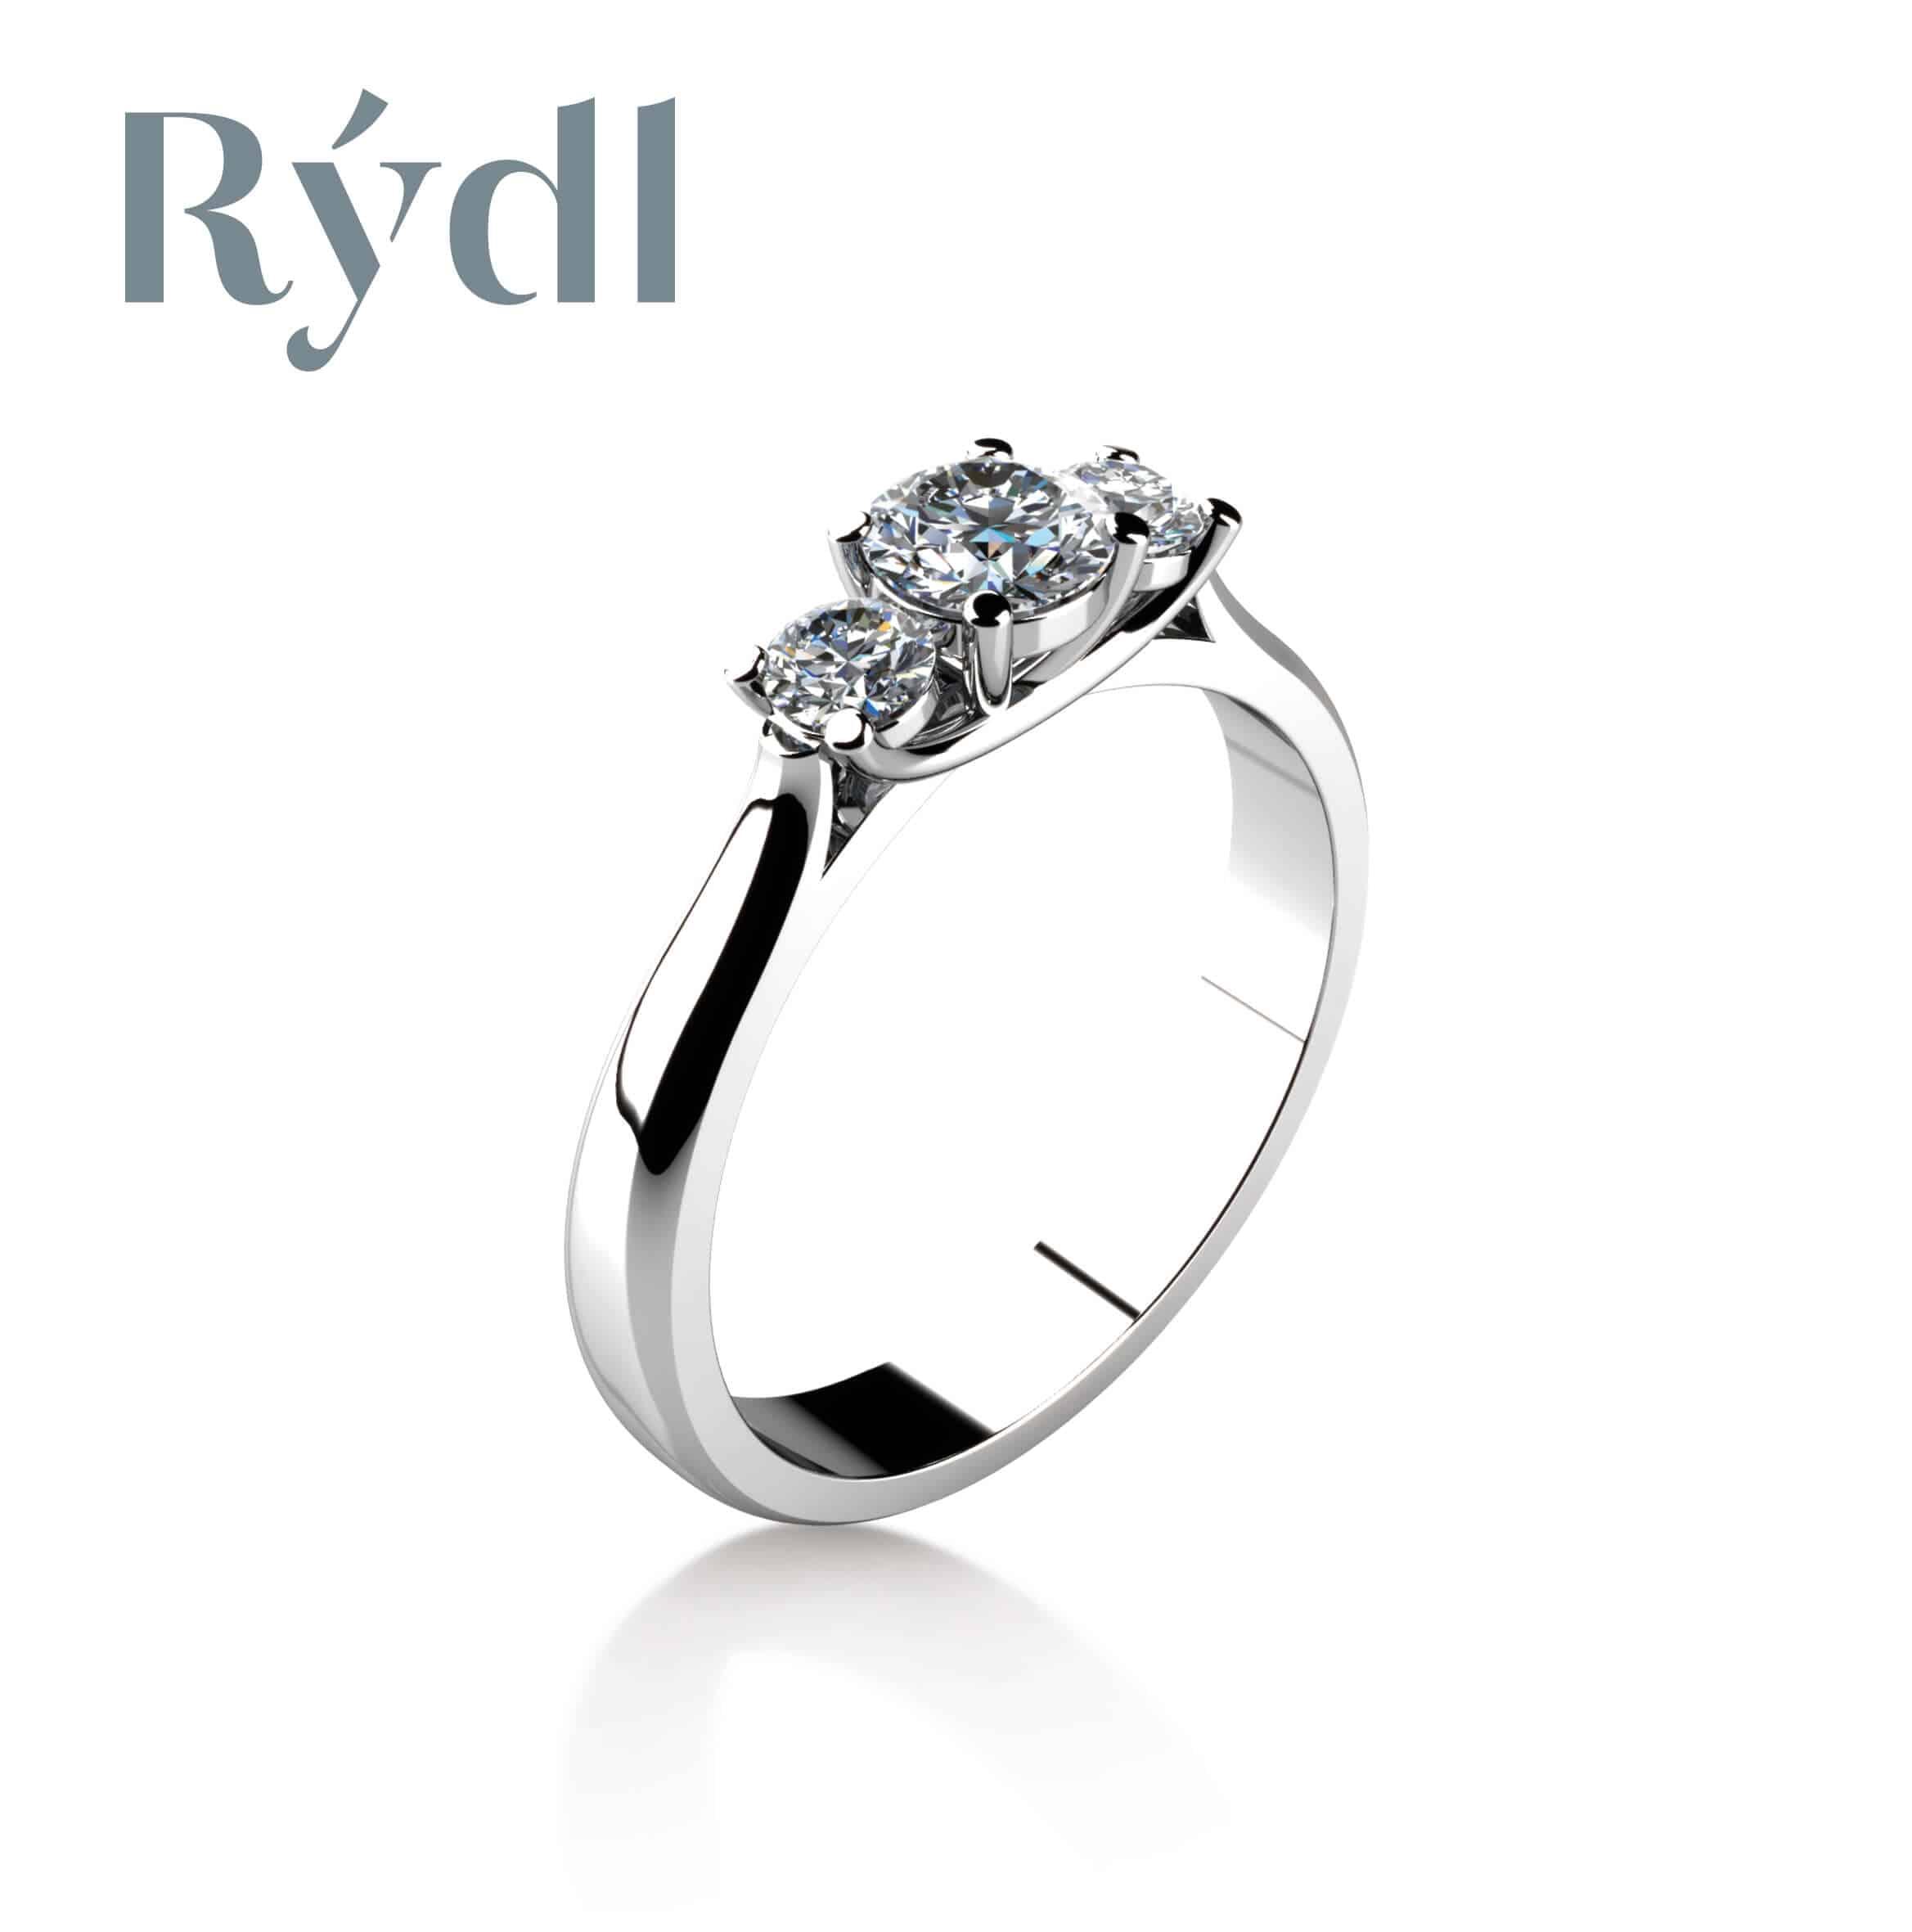 Proc Diamanty Patri Na Zasnubni Prsteny Svet Svateb Cz